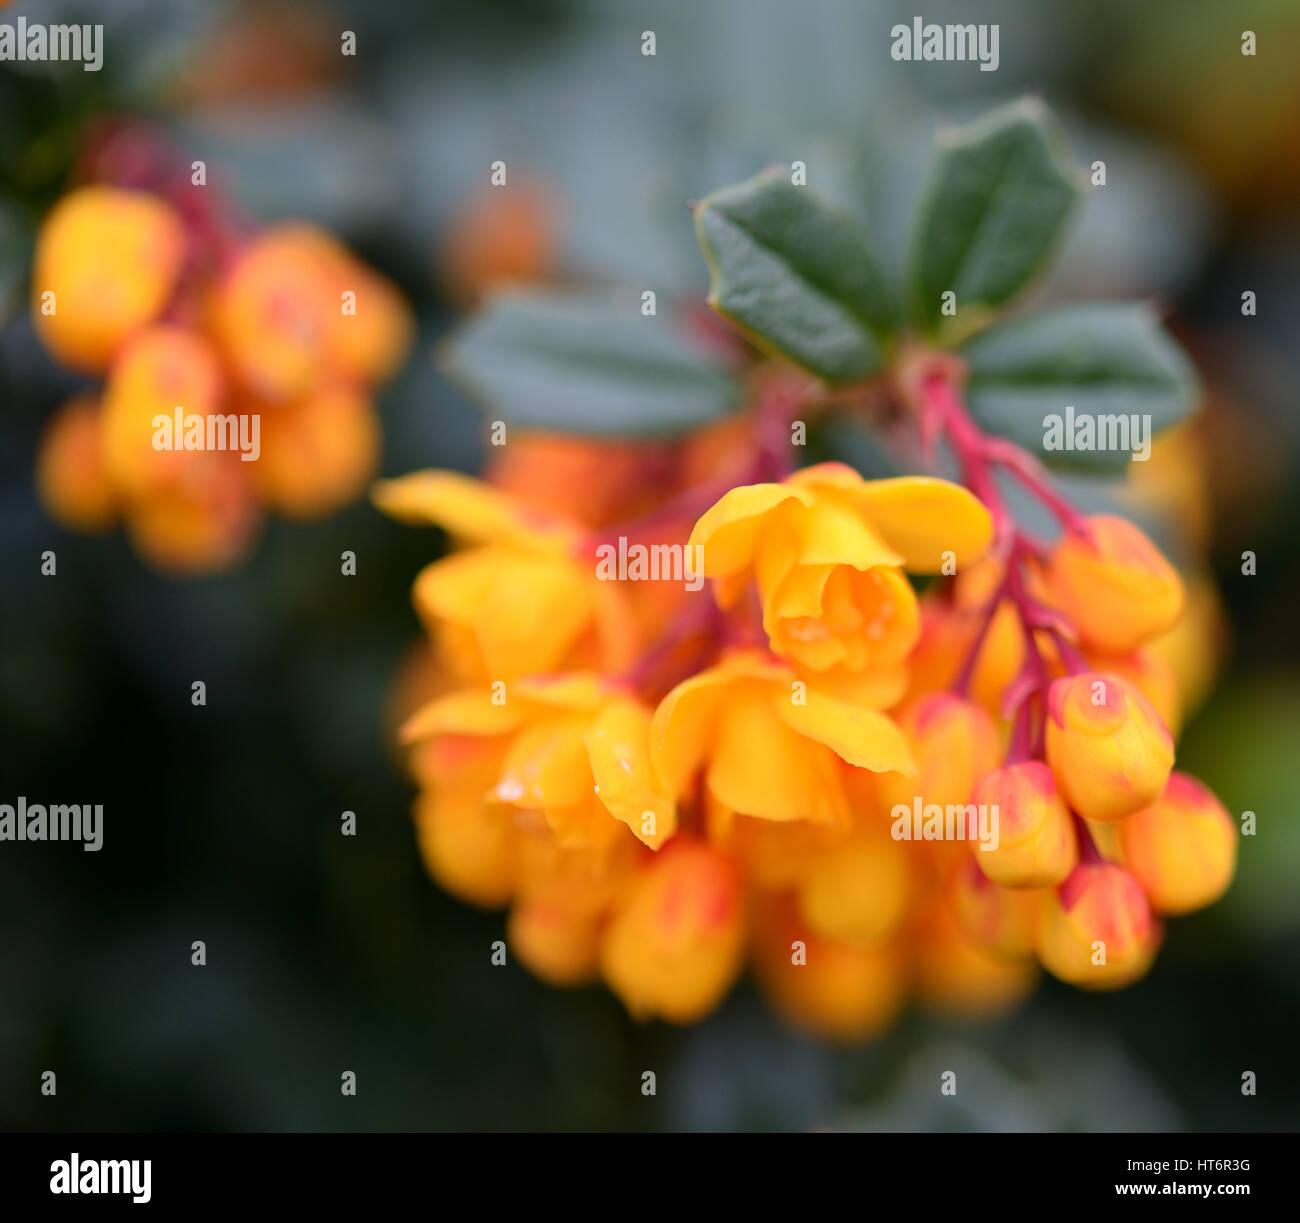 Clusters Of Orange Yellow Berberis Flowers On Dark Green Spiky